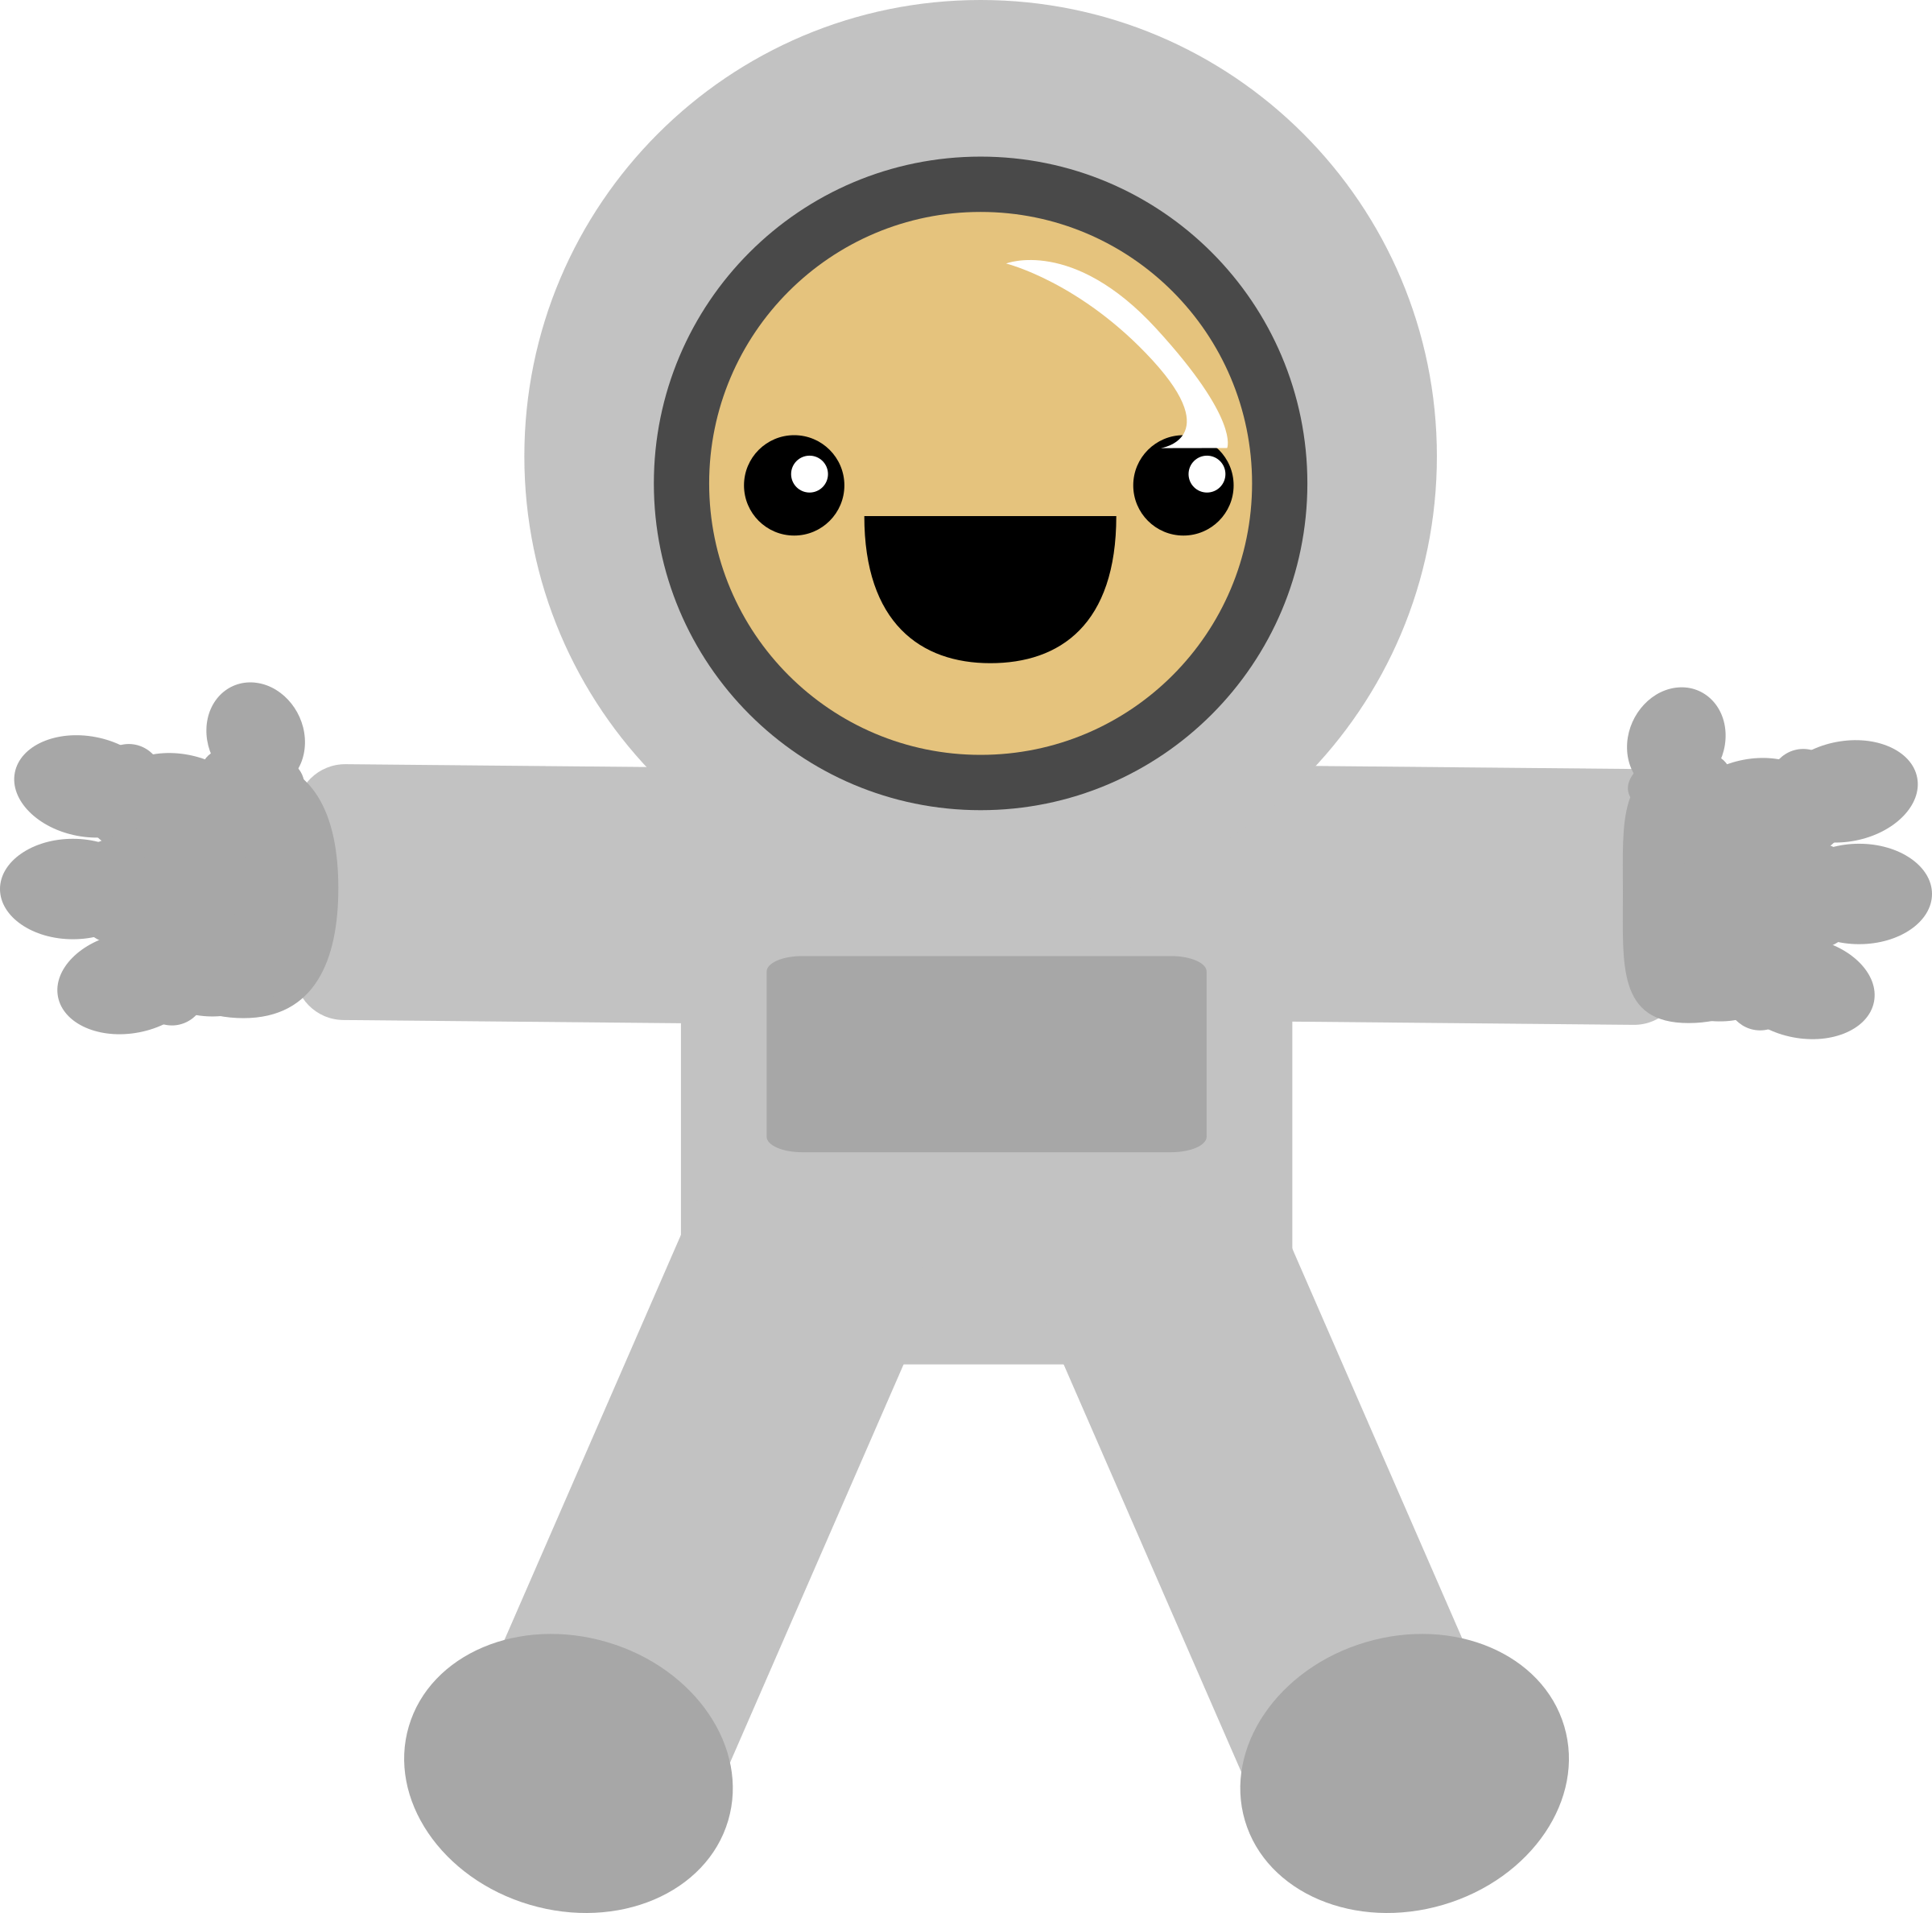 Small clipart astronaut Astronaut astronaut Clipart